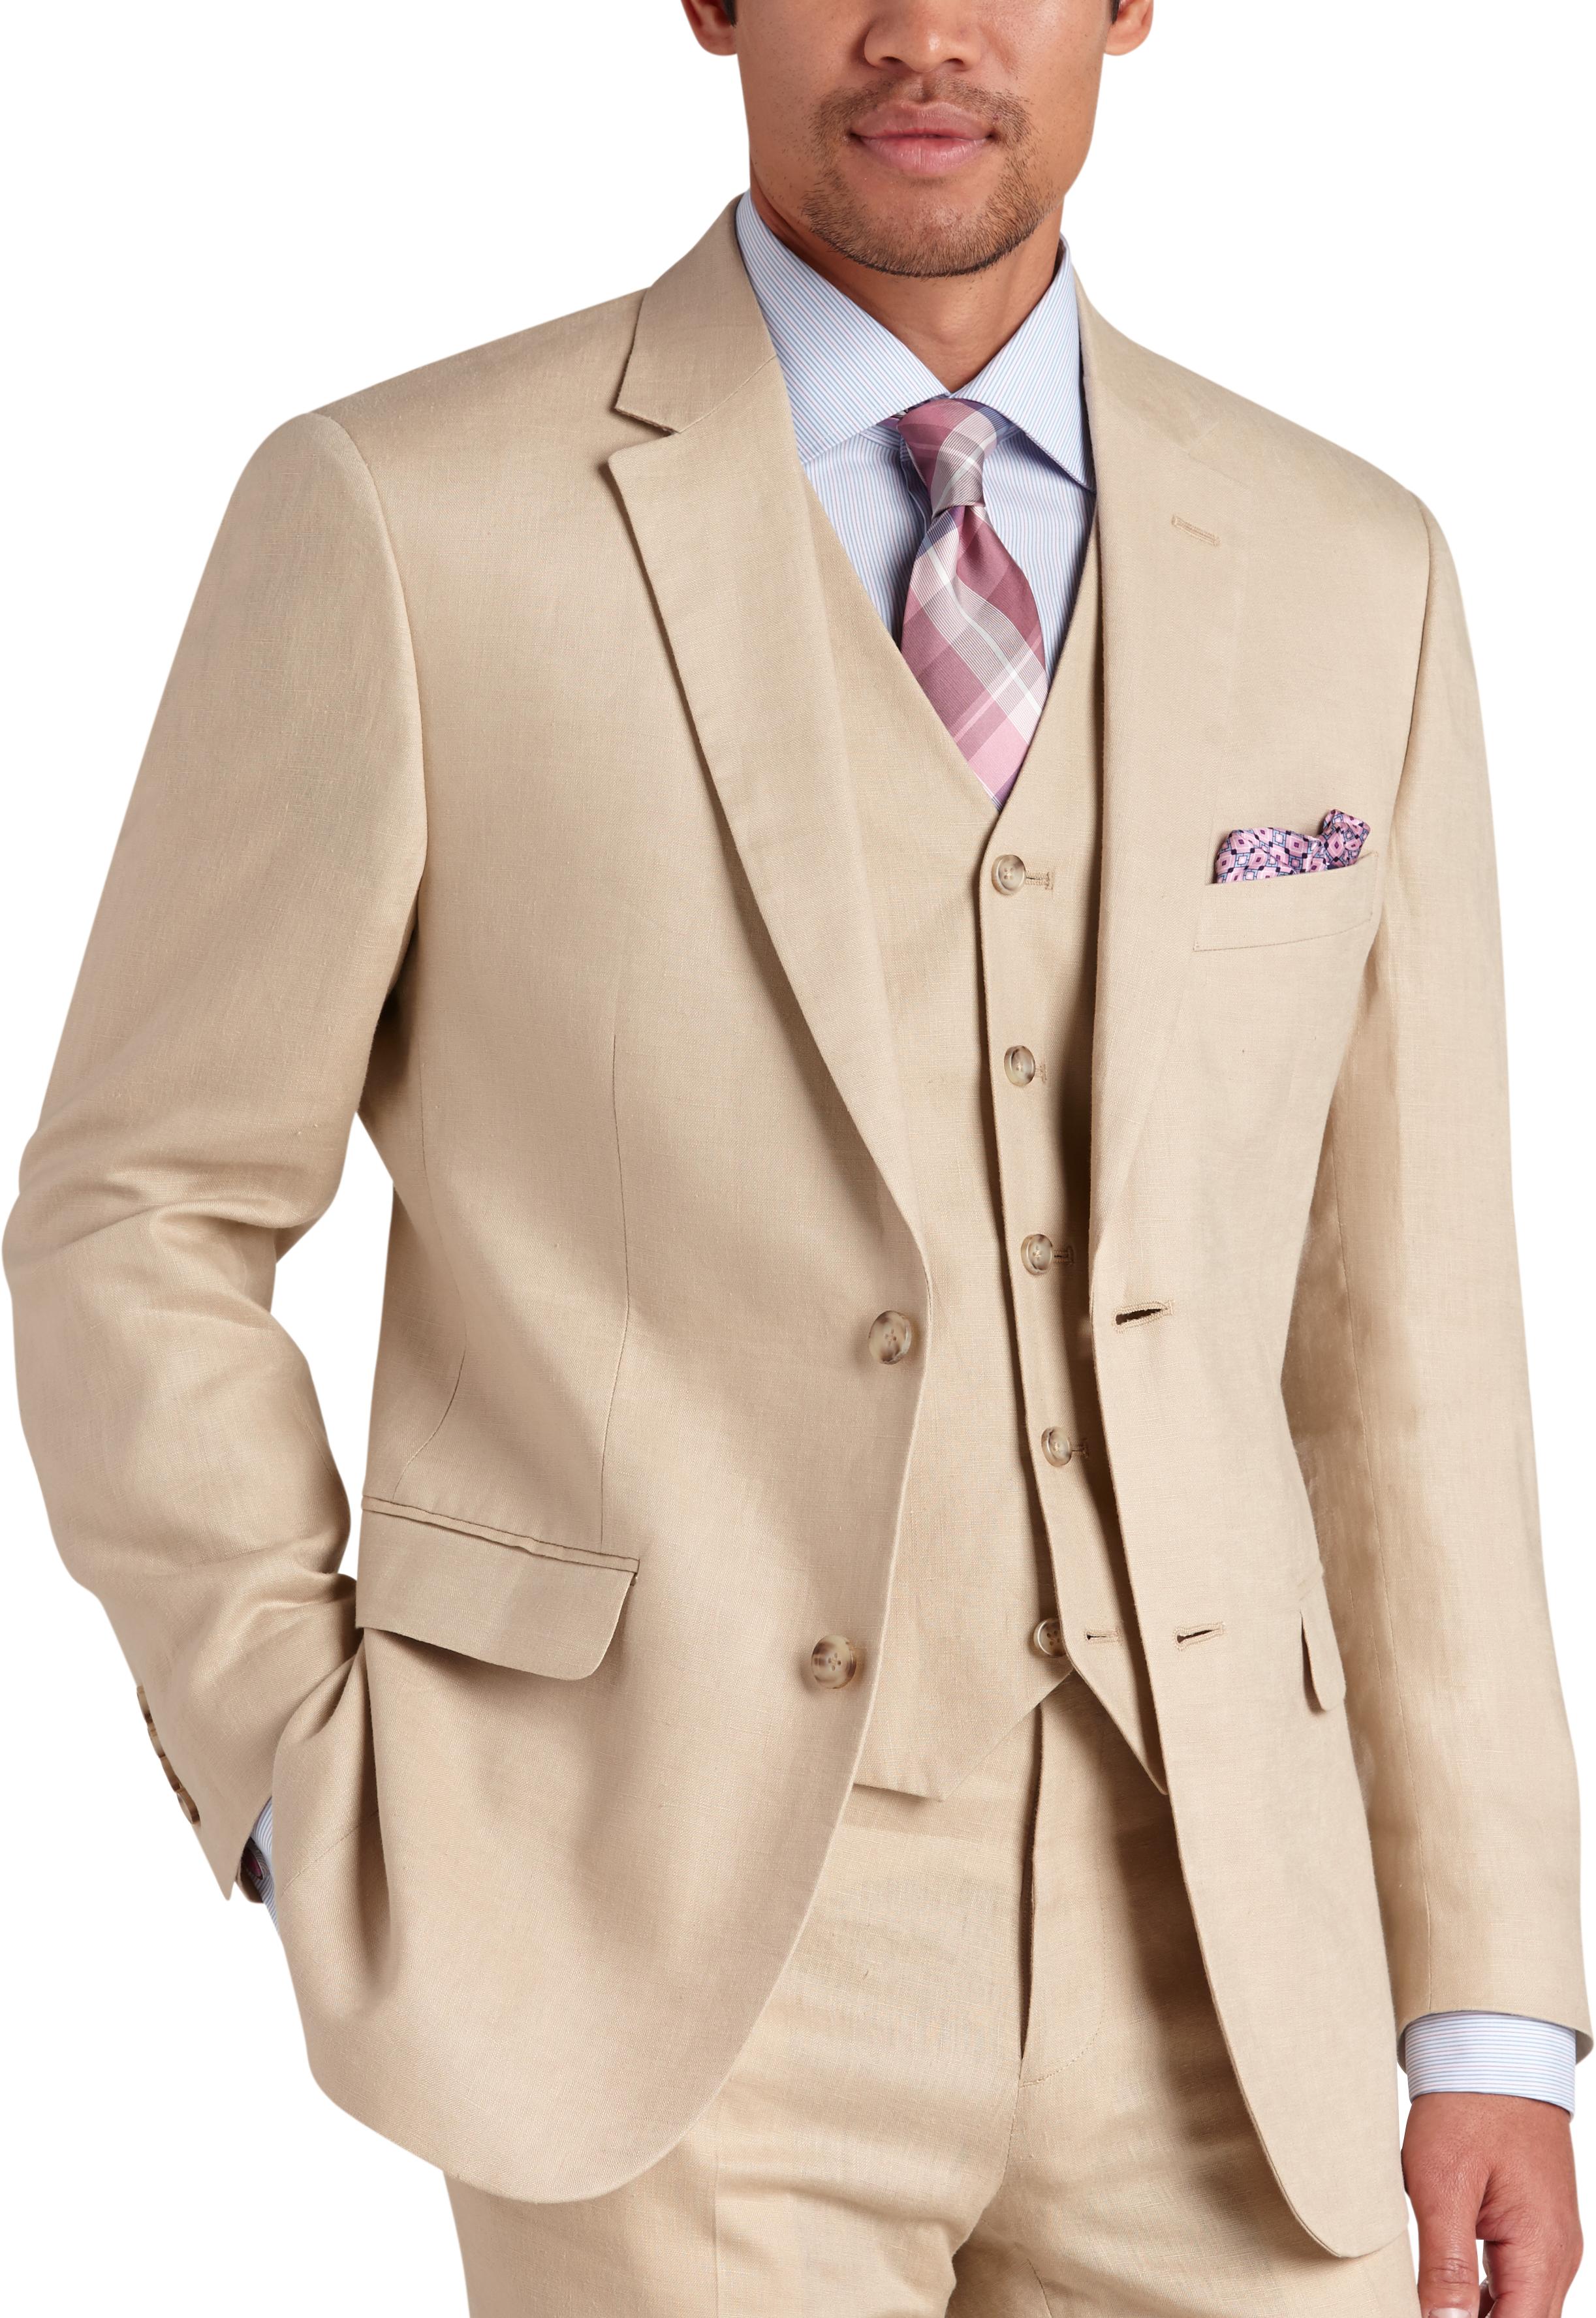 To Uomo Platinum Modern Fit Linen Suit Separates Coat Tan Mens Home Men S